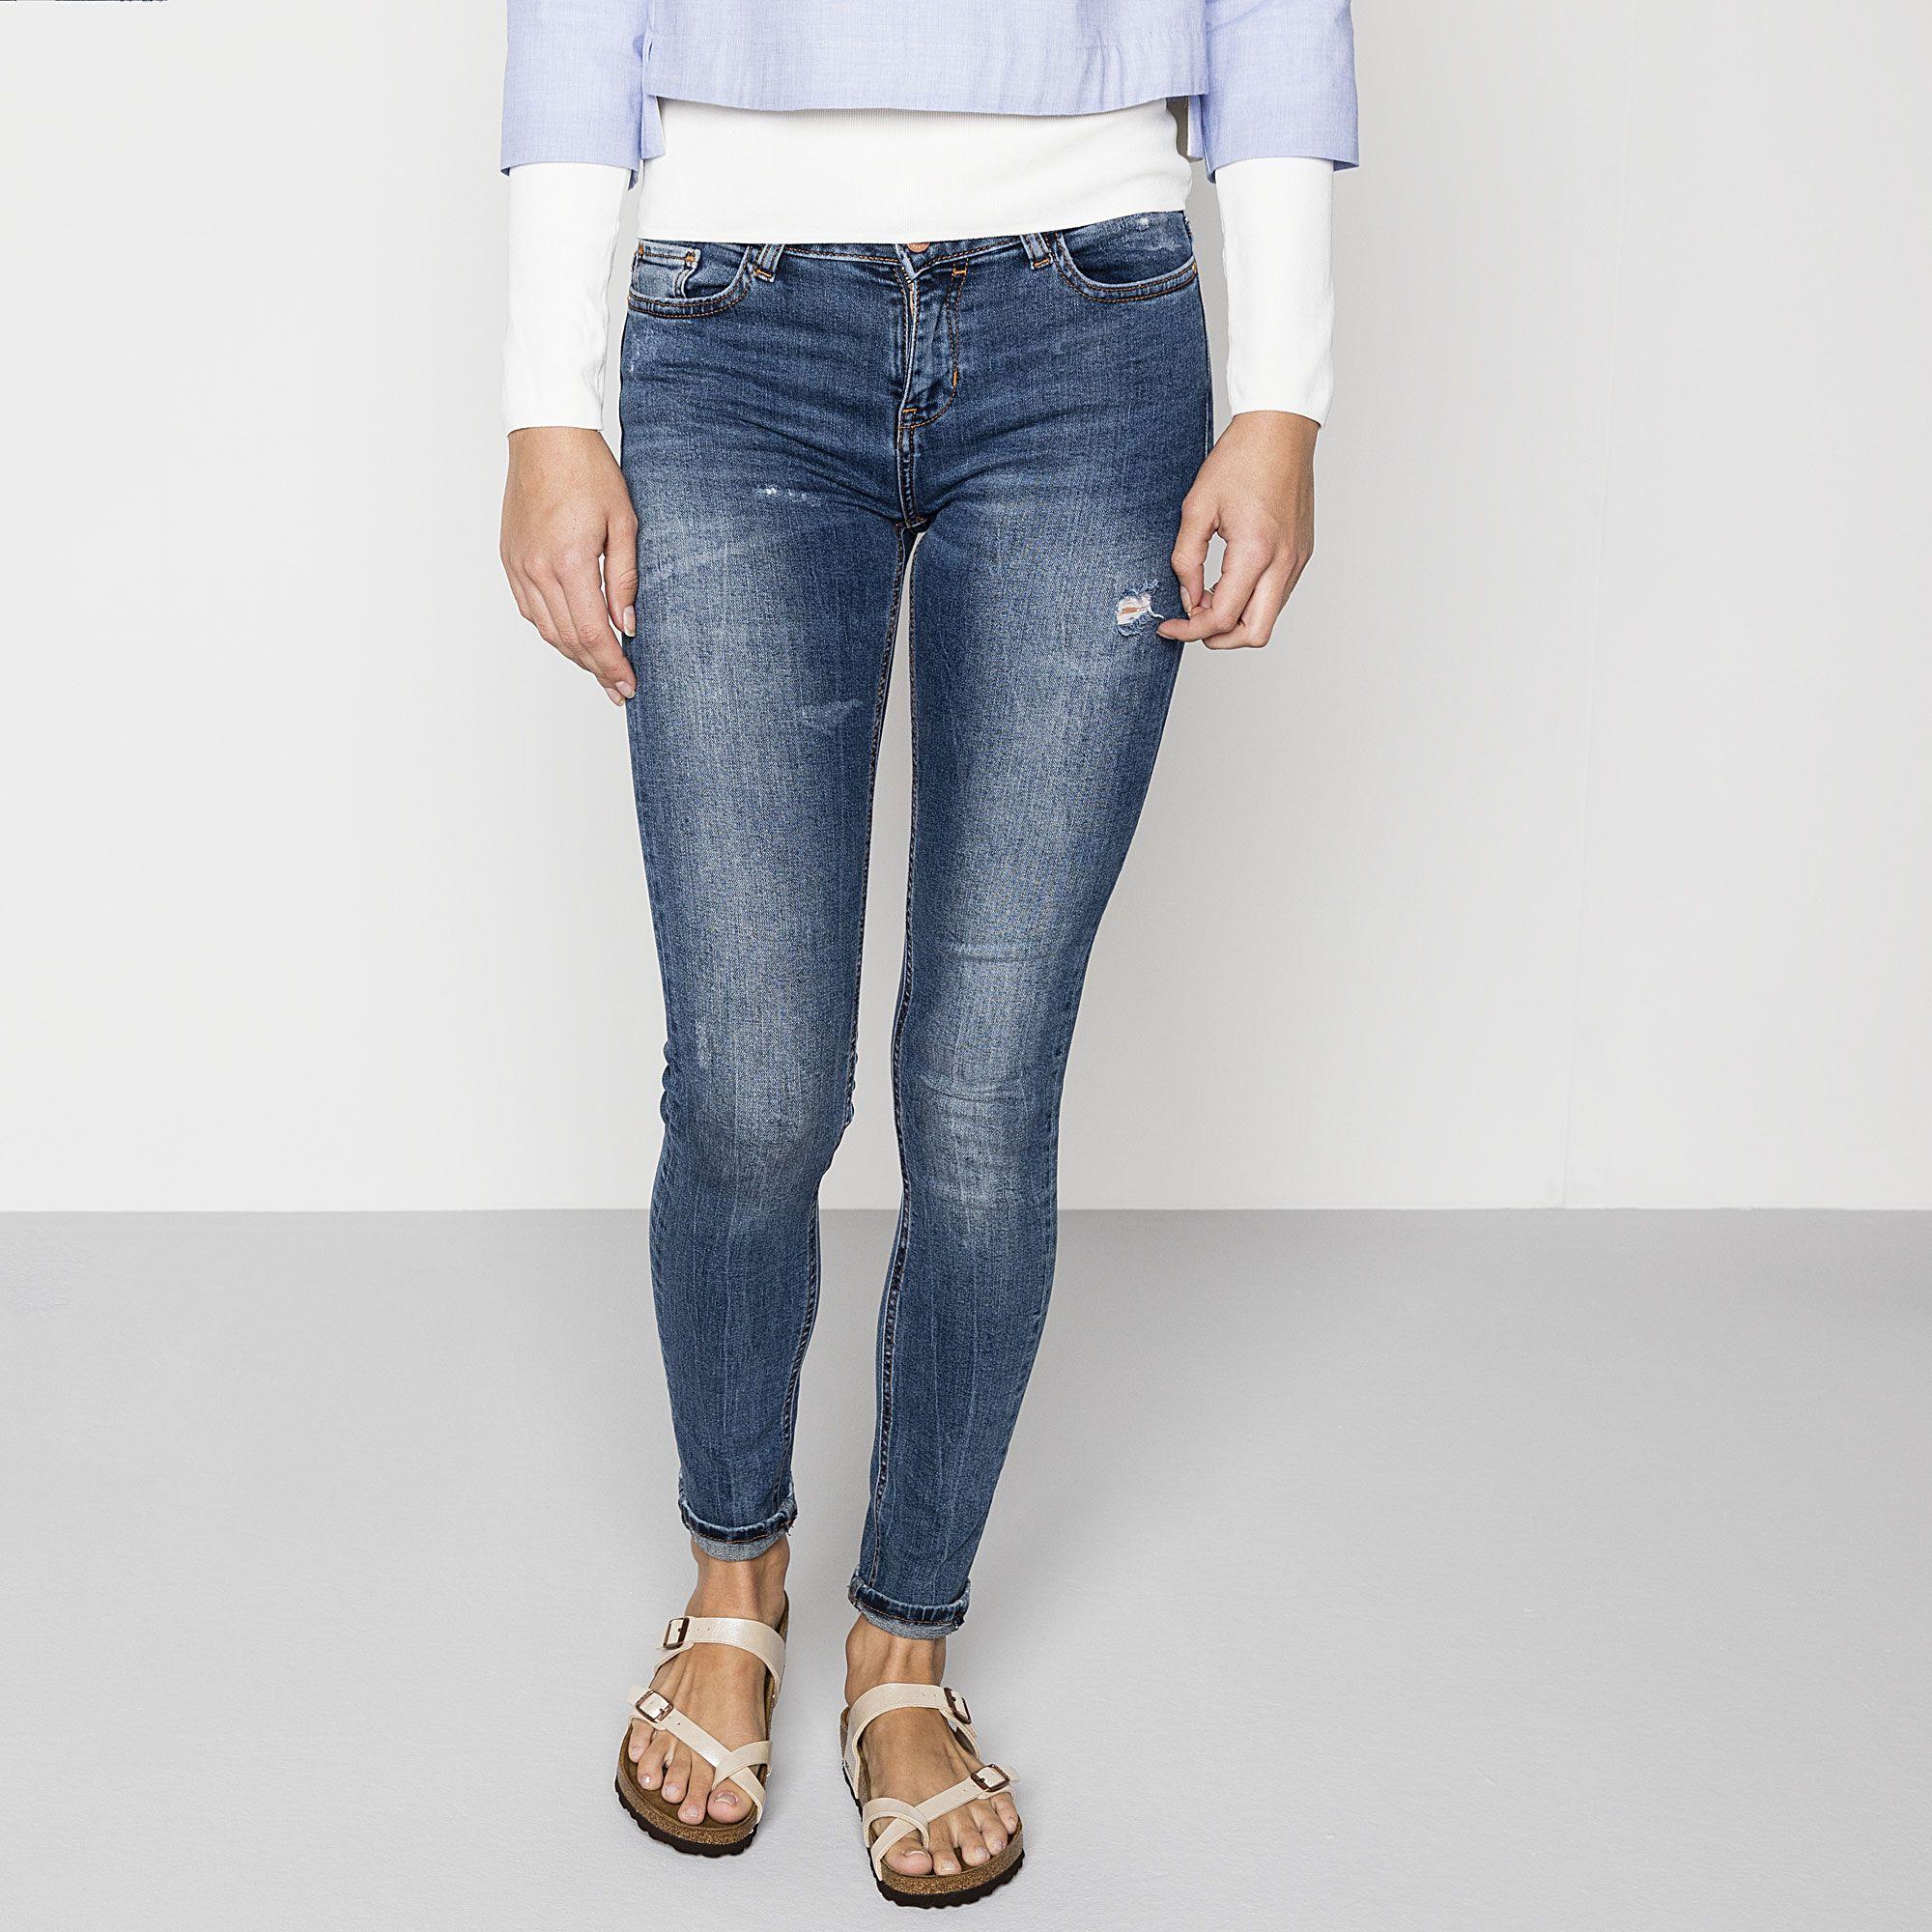 5b880a51fbc9b Mayari Birko-Flor in 2019   I Love Shoes!   Birkenstock, Jeans, Fashion